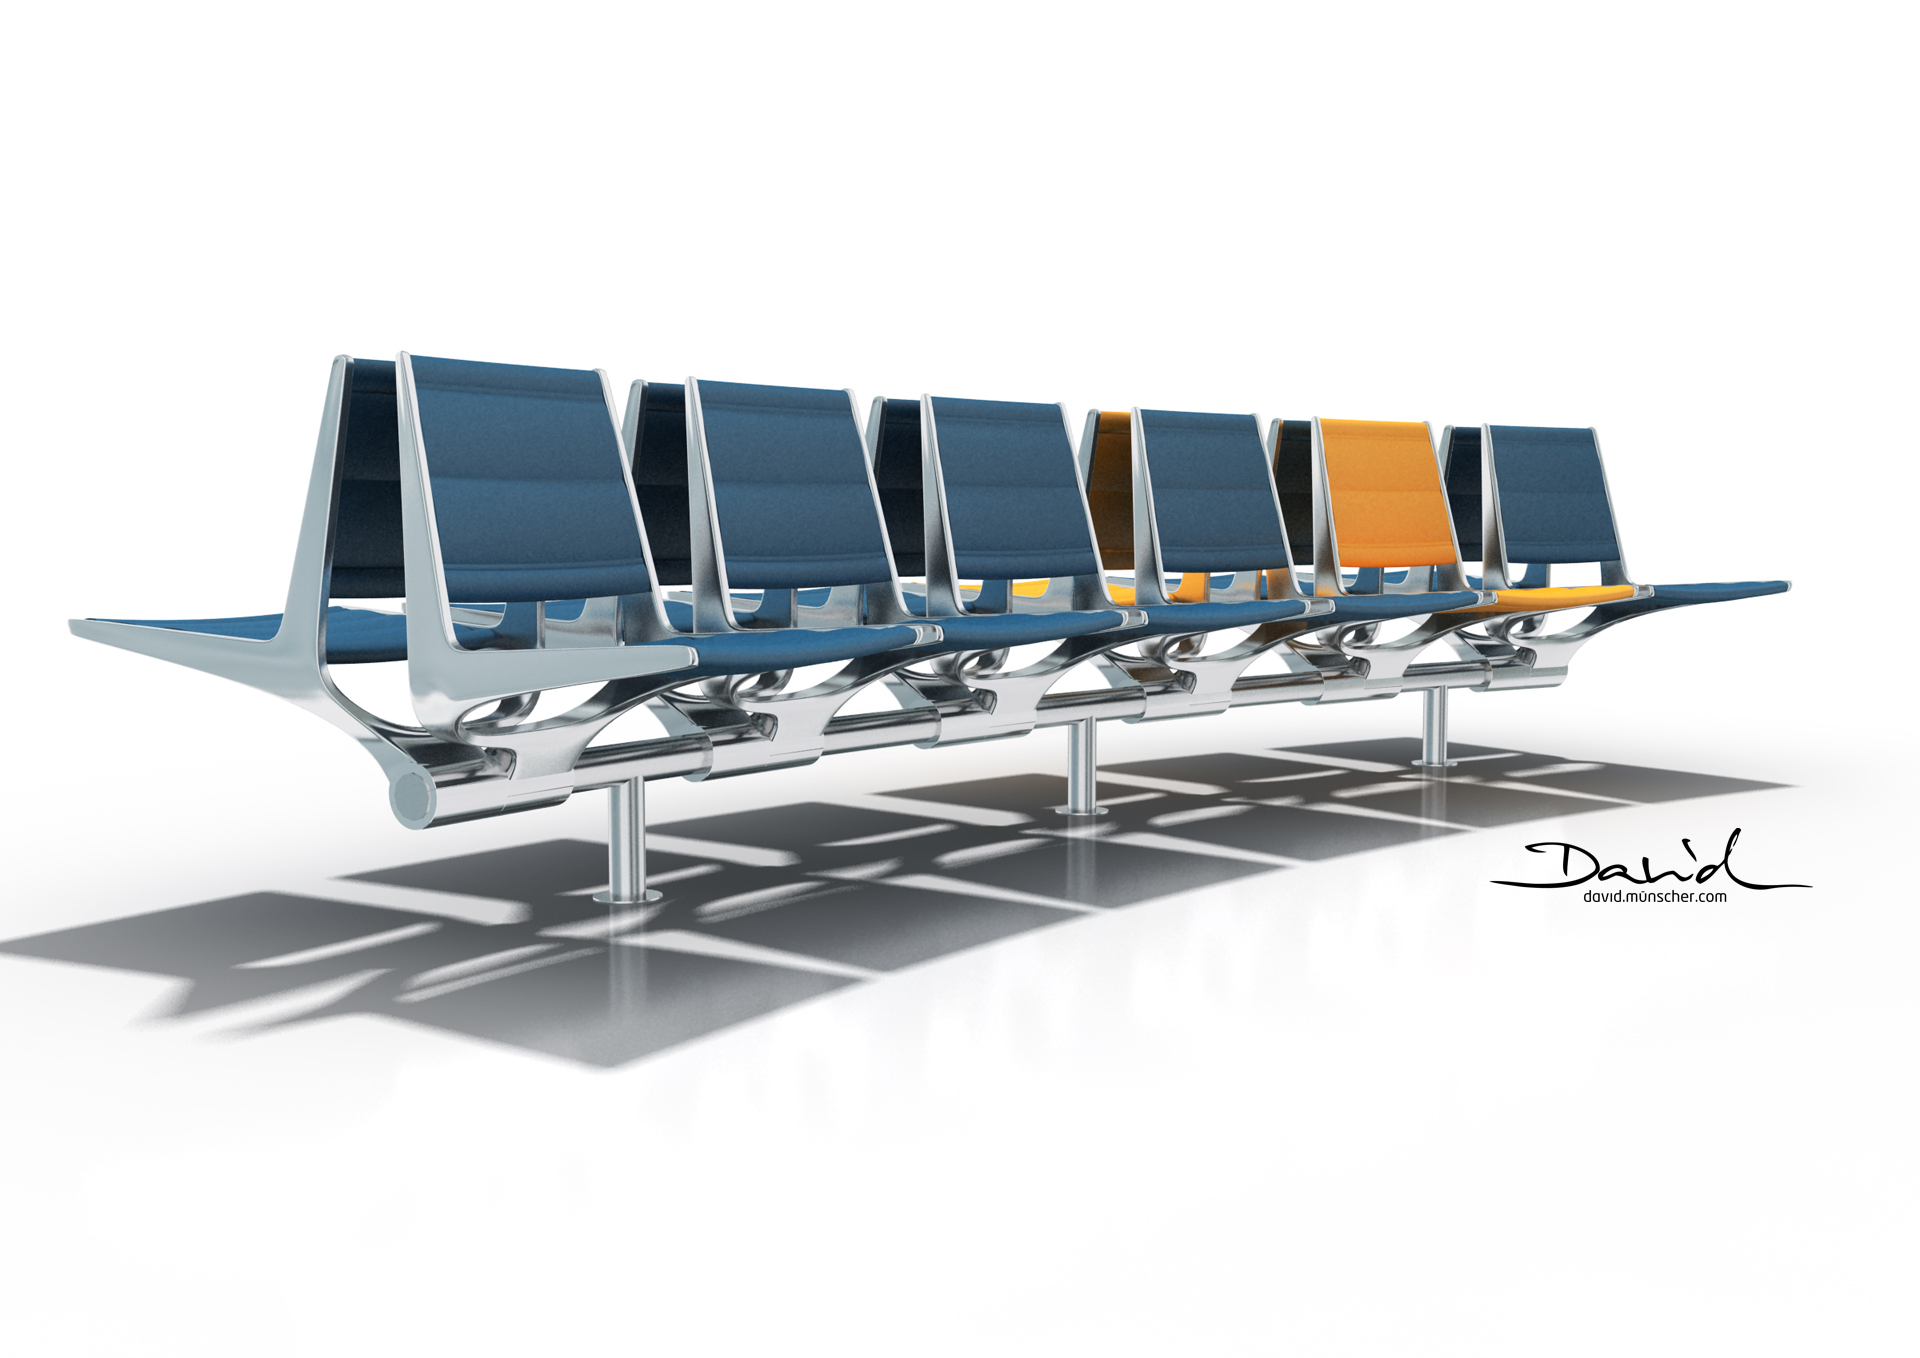 Modular Airport Seating